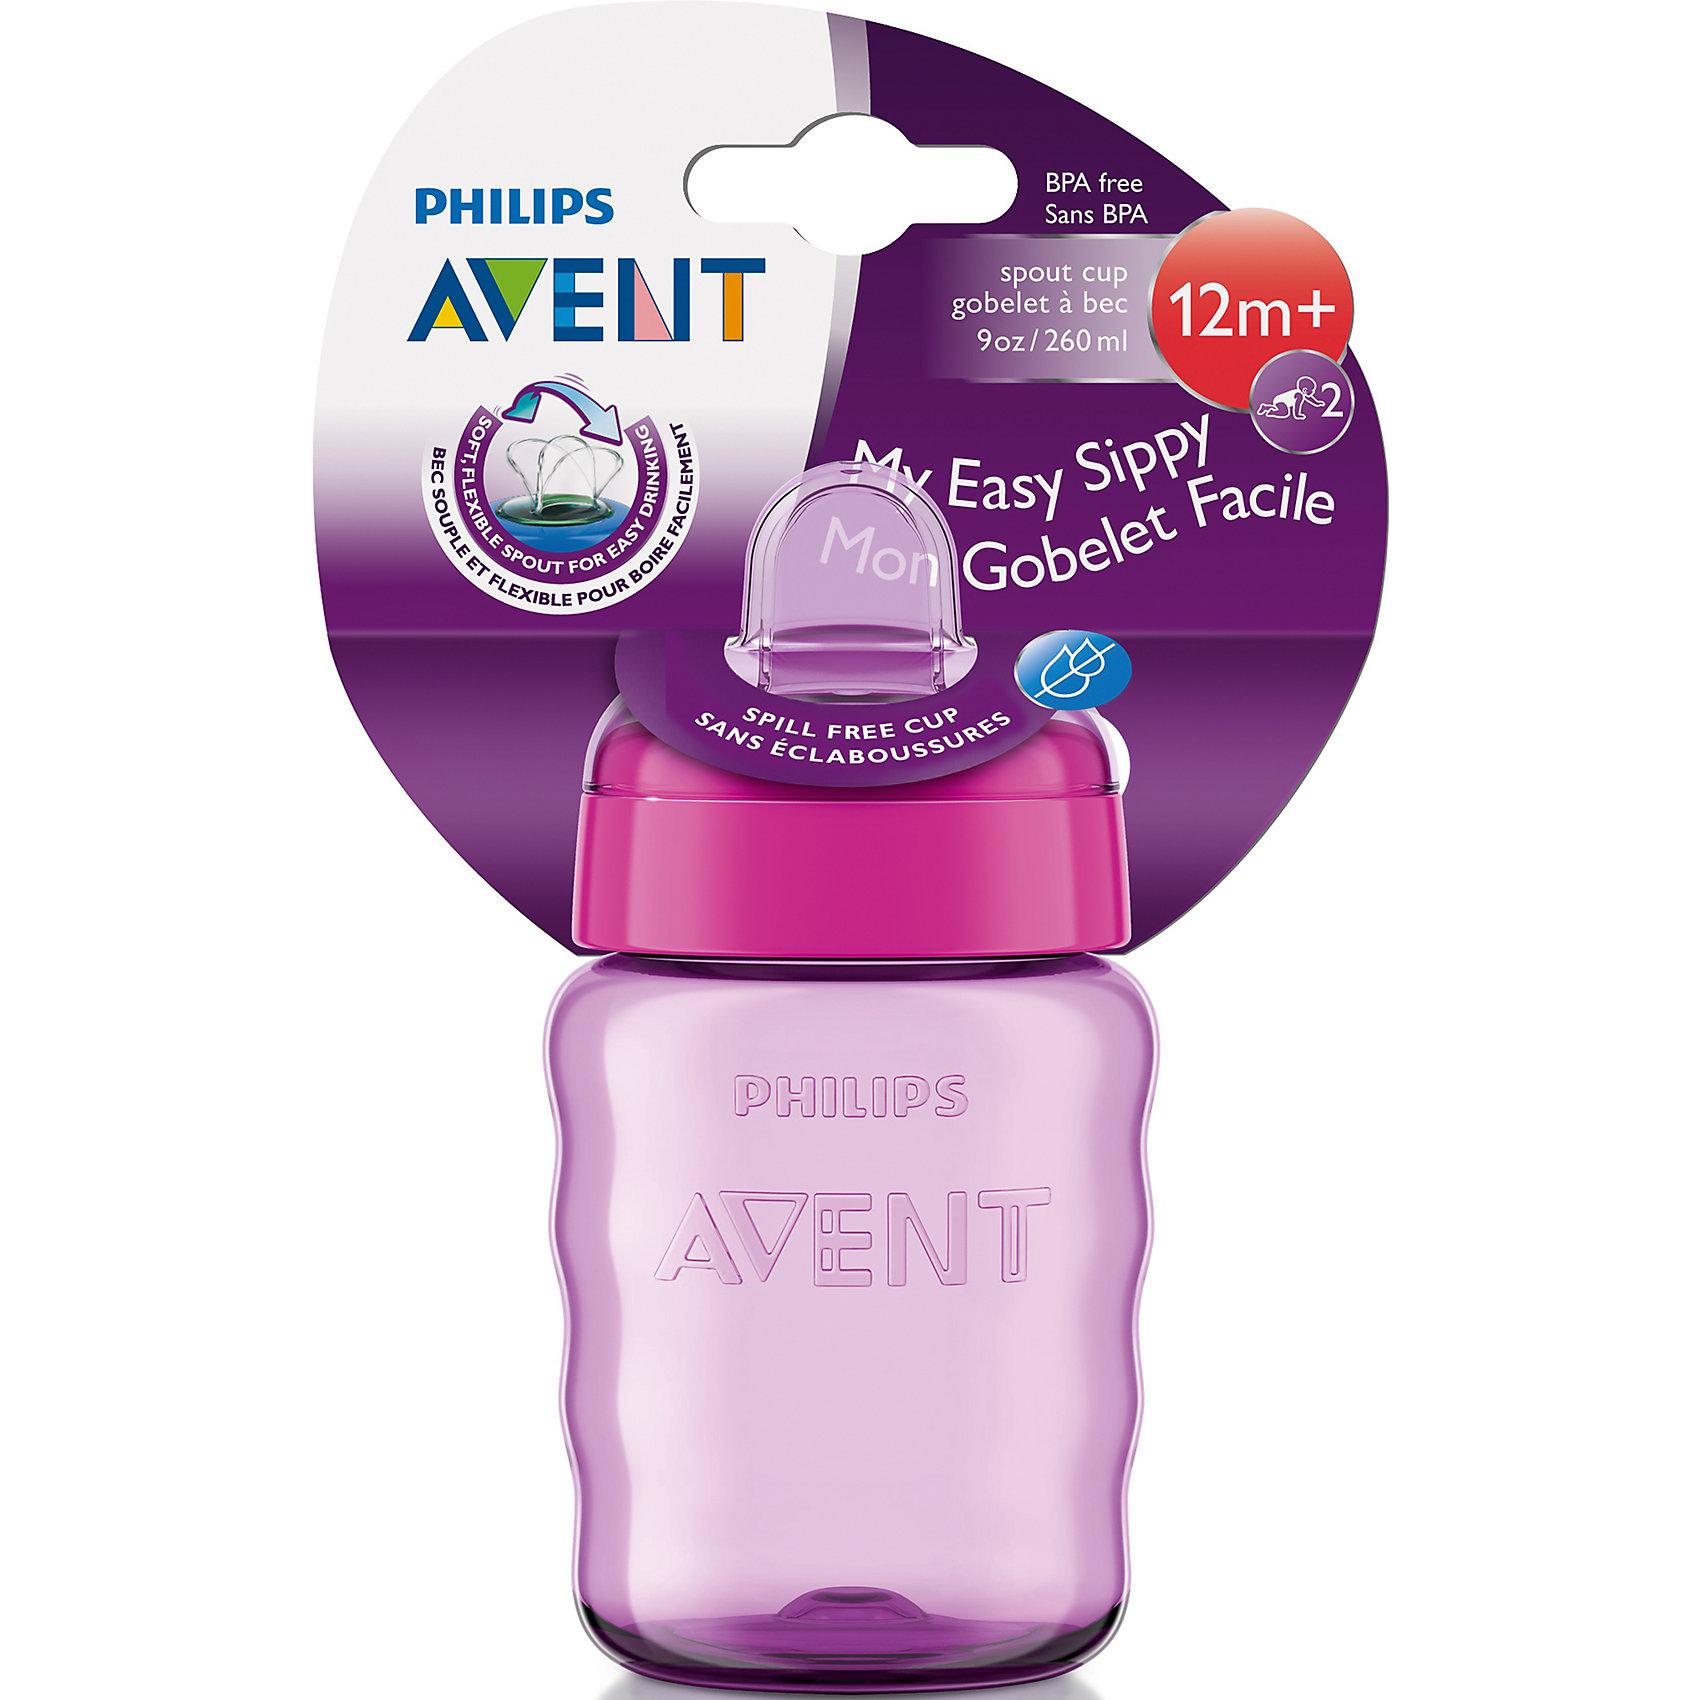 PHILIPS AVENT Чашка-поильник с носиком Comfort, 260 мл, Avent, сиреневый/розовый